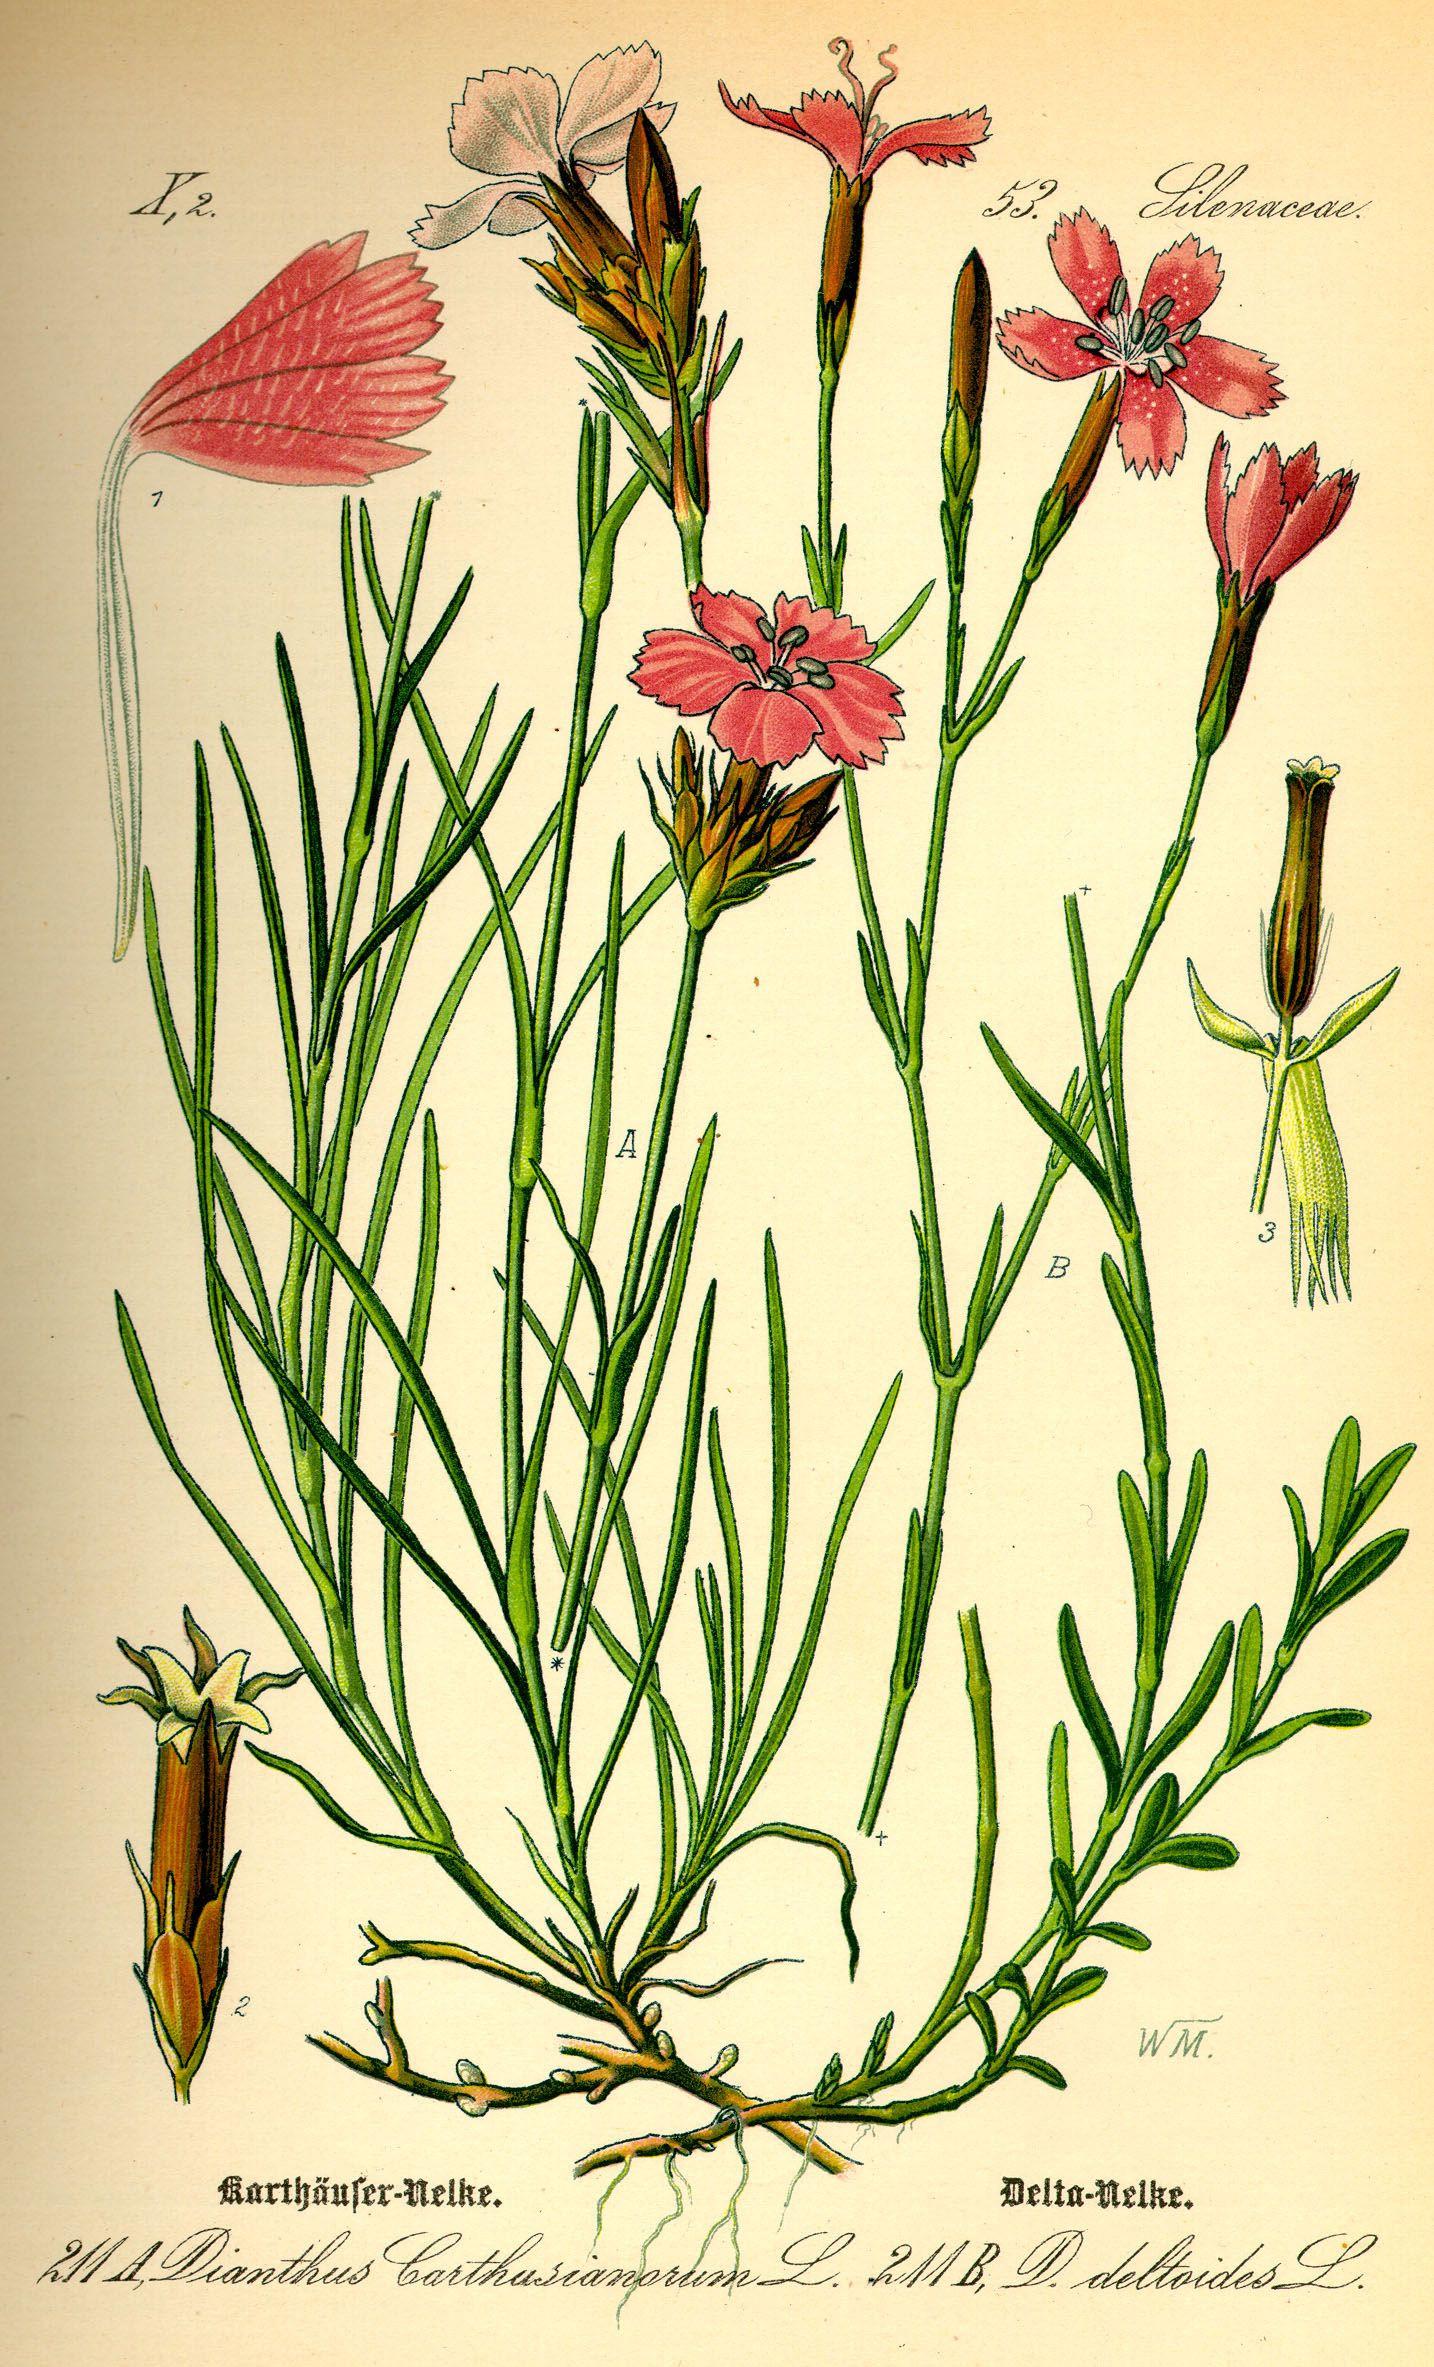 Mélange Indigo Dianthus deltoides